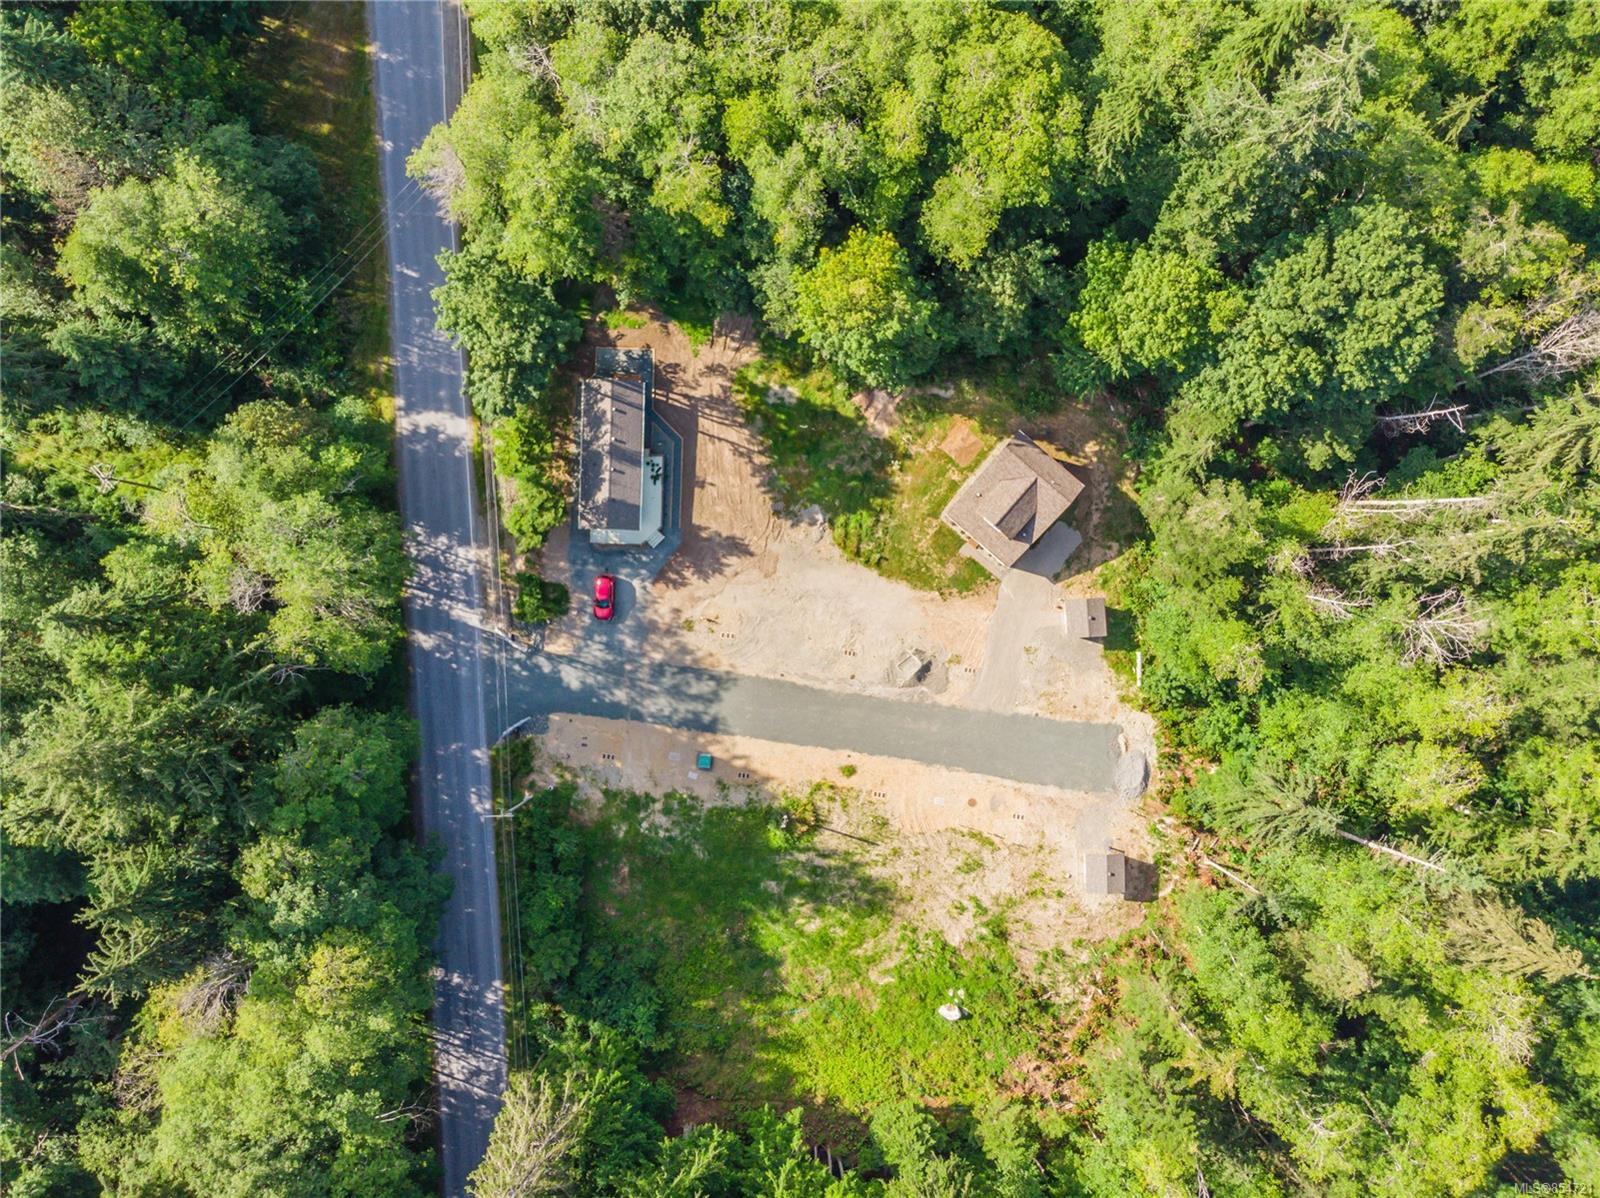 Main Photo: 6 638 Green Rd in : Isl Quadra Island Land for sale (Islands)  : MLS®# 854721